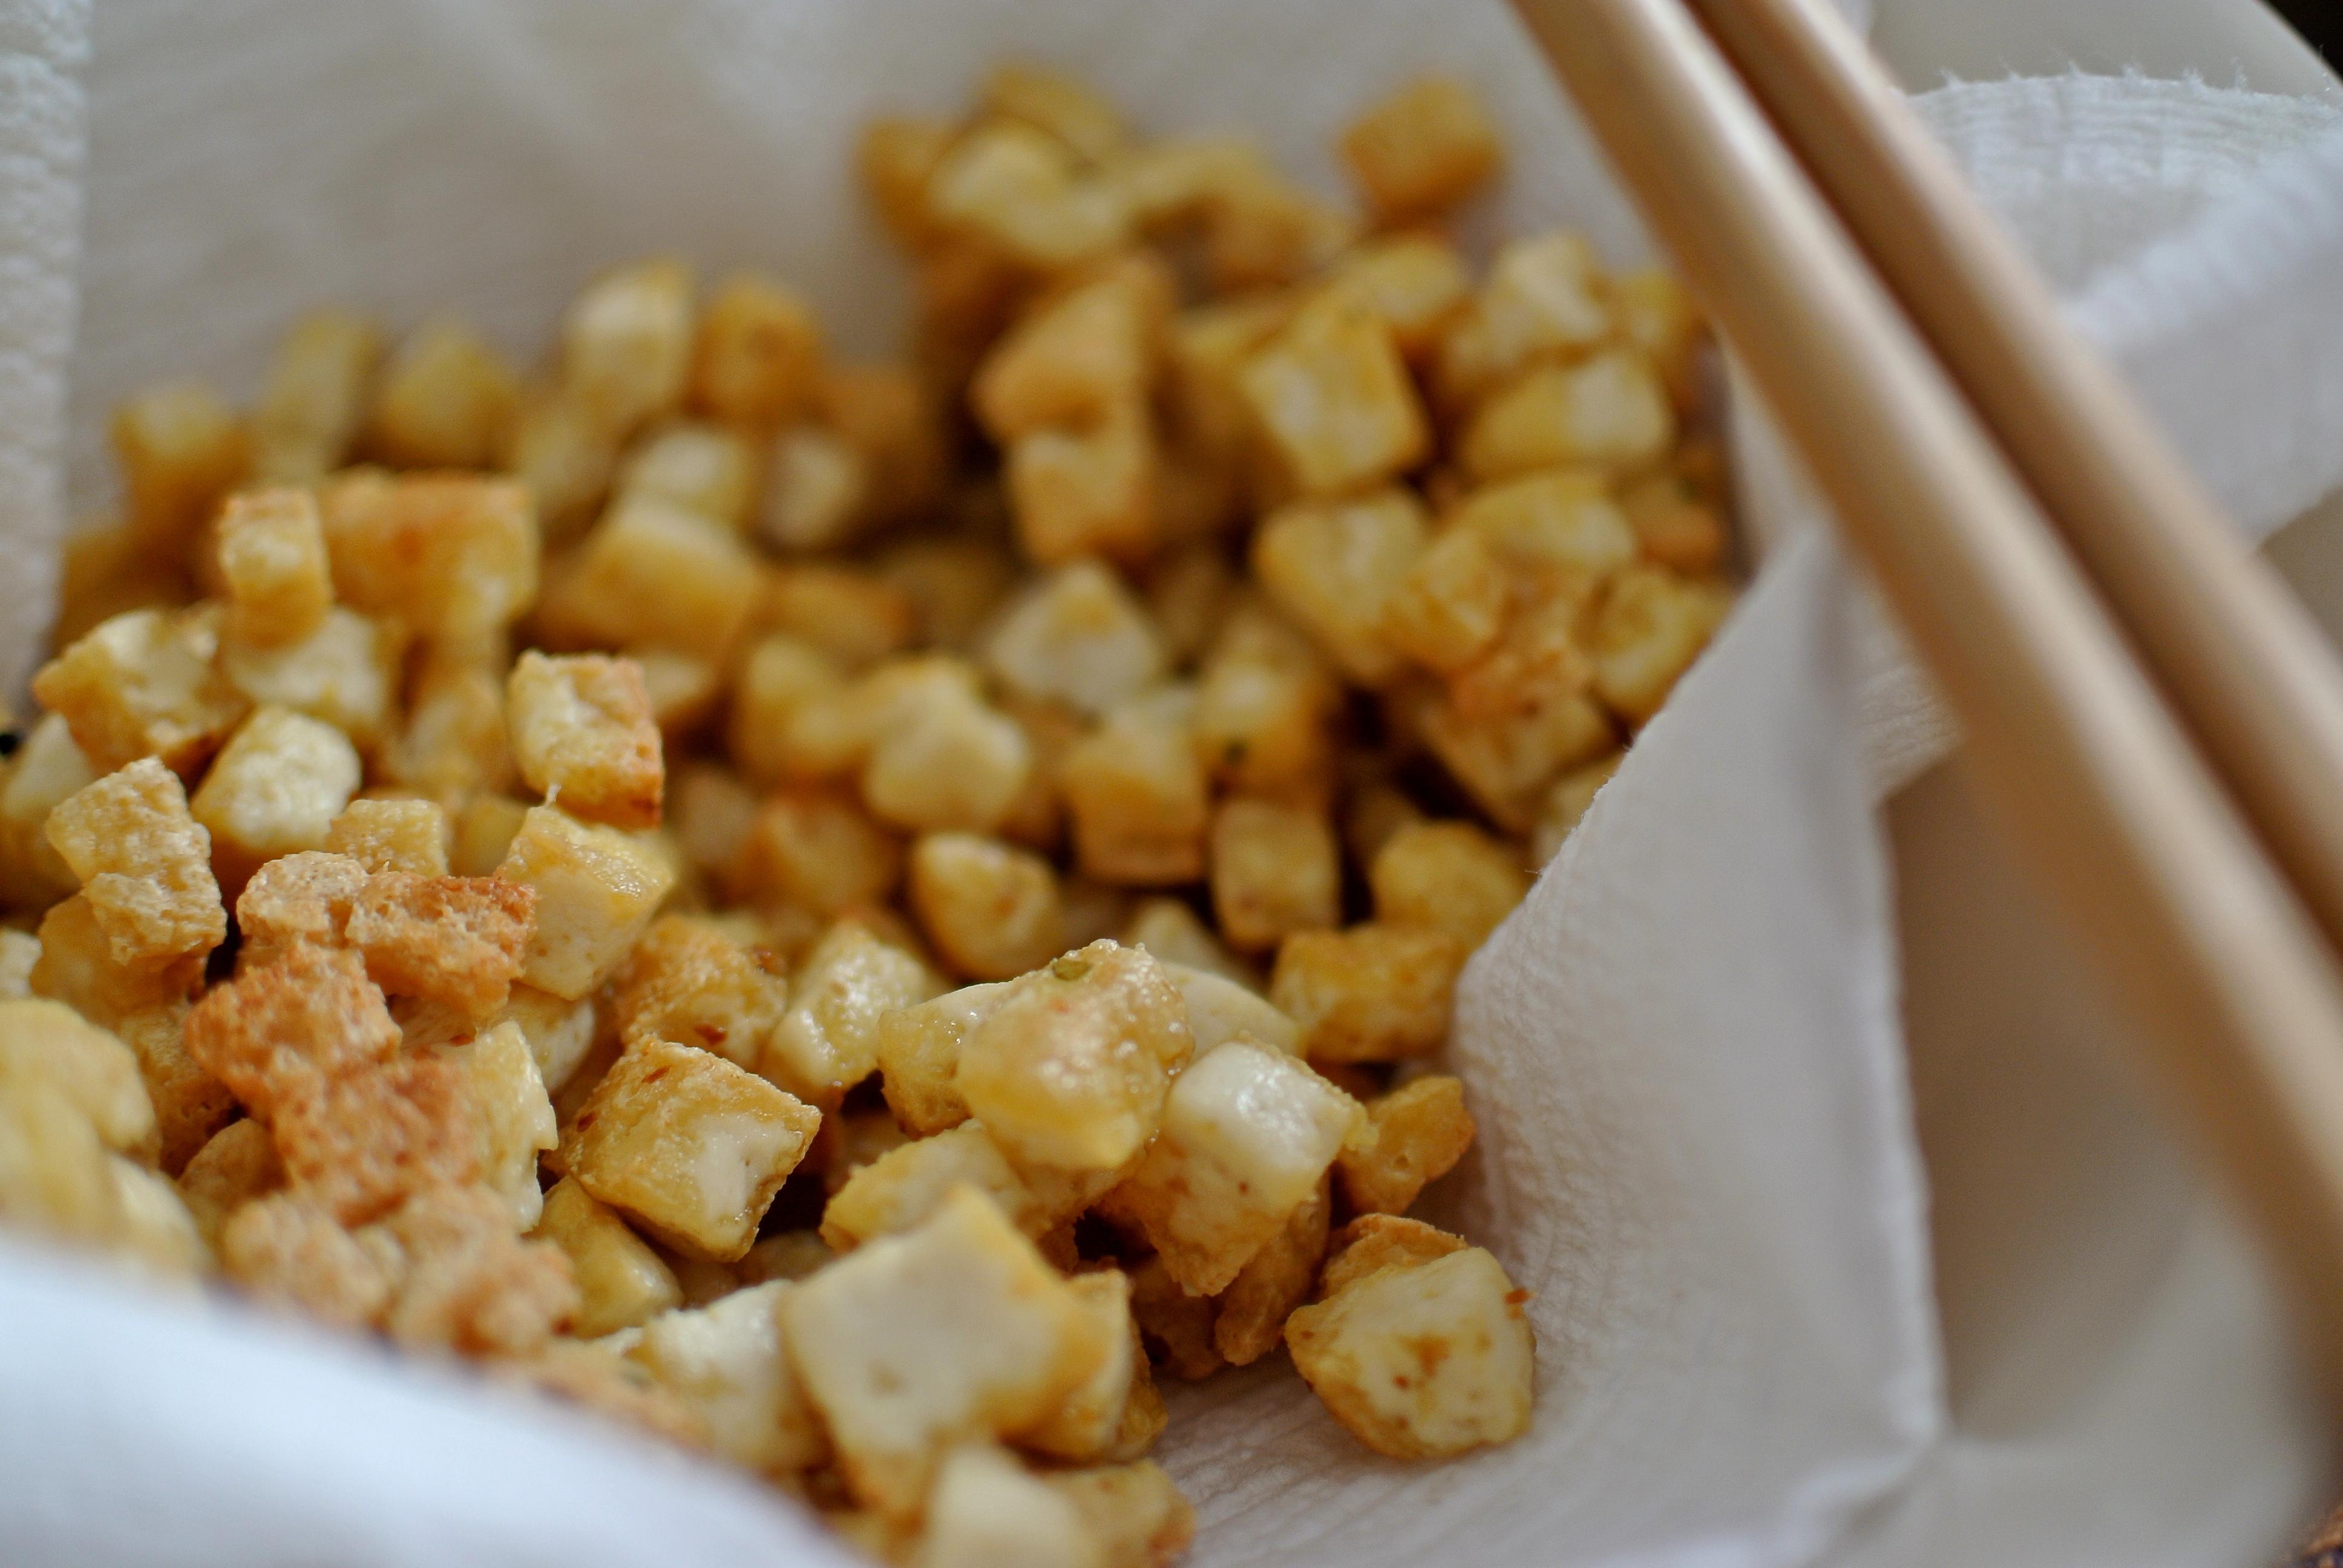 Fried Tofu Cubes